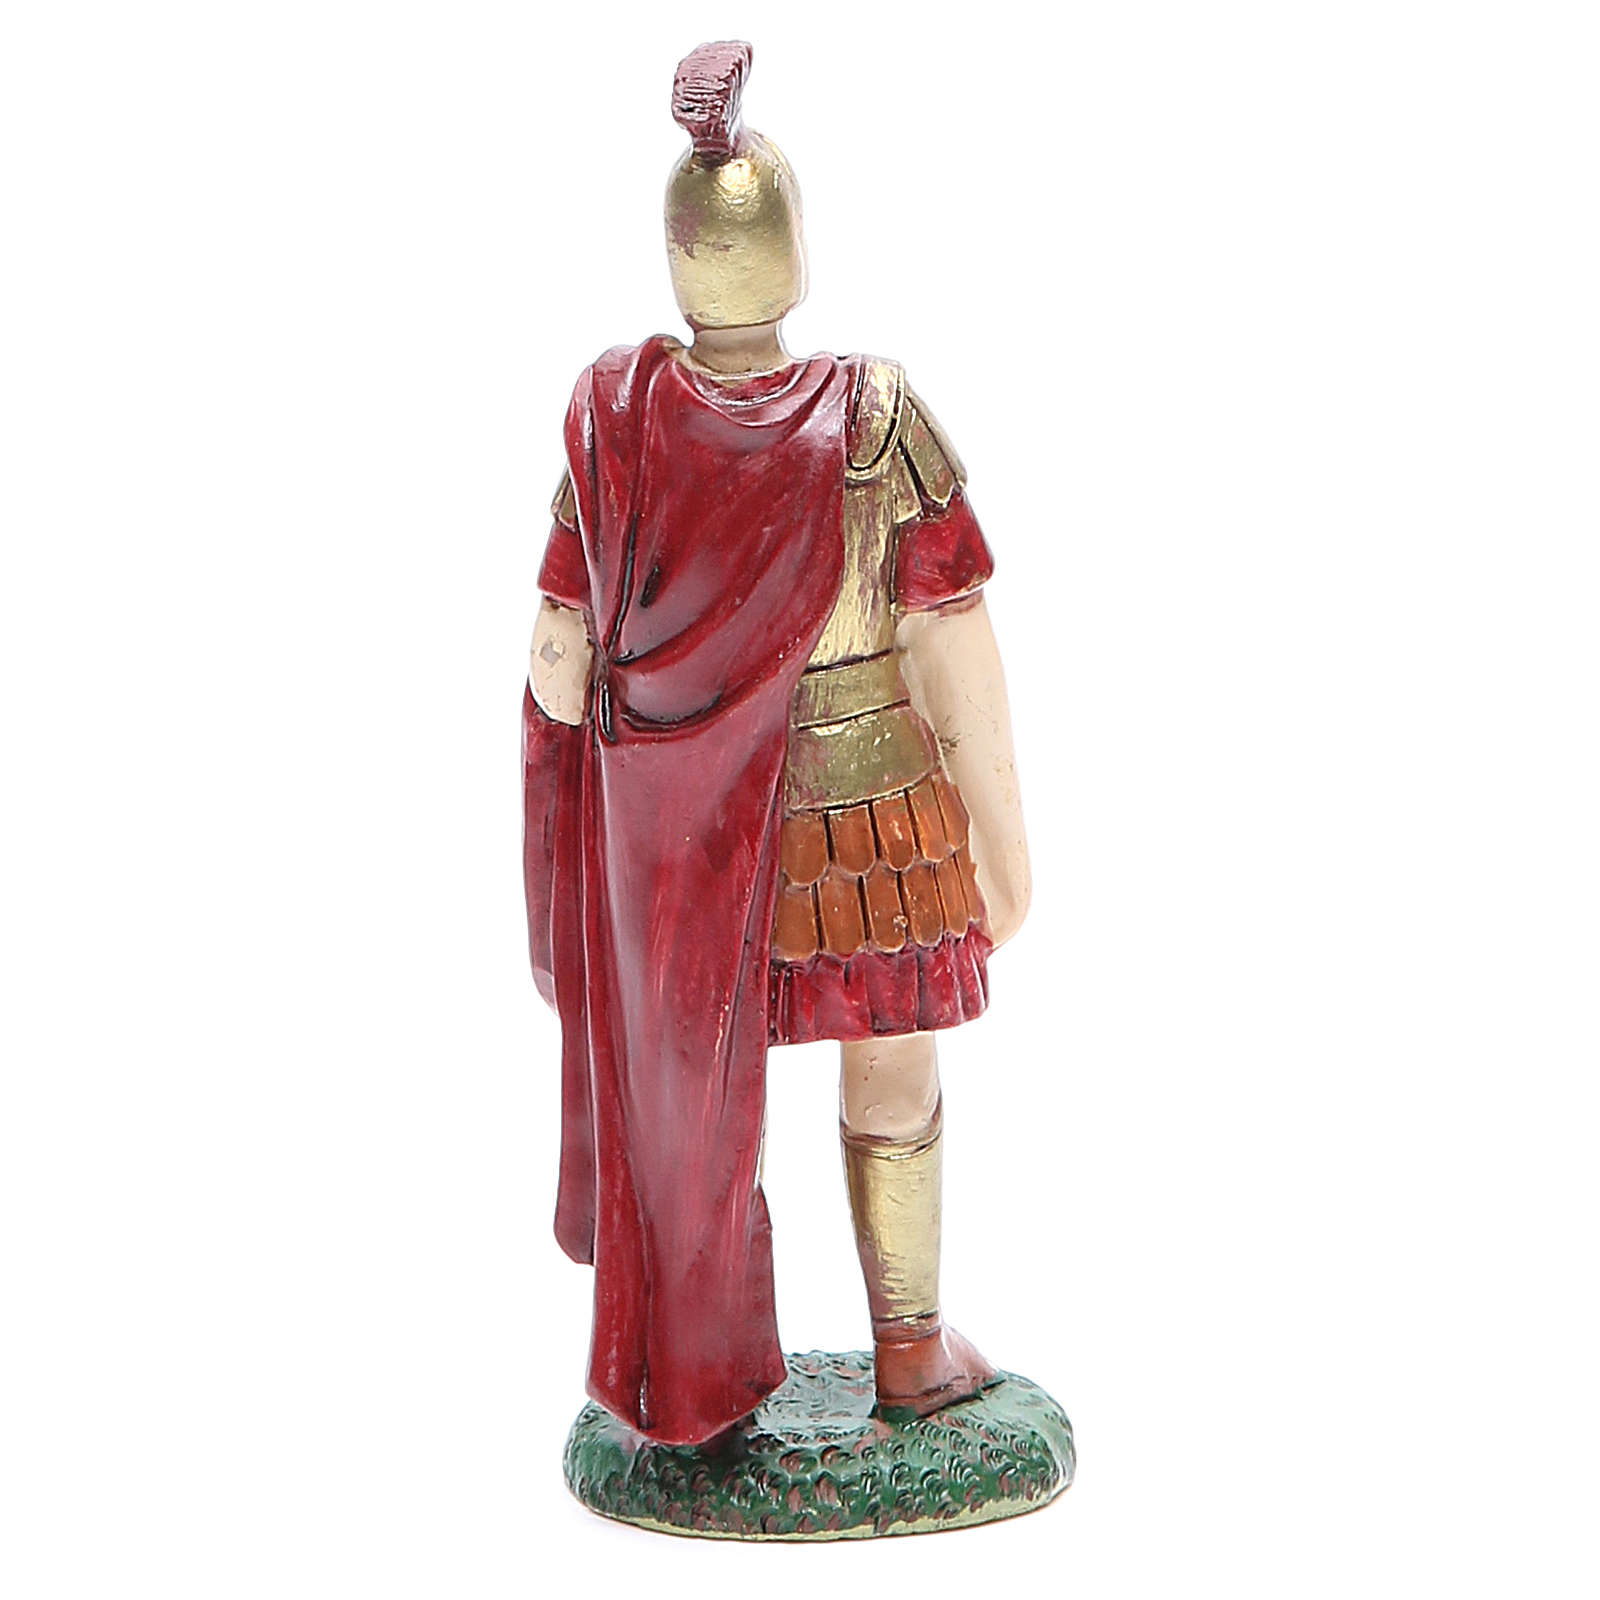 Soldato romano cm 12 Linea Martino Landi 3